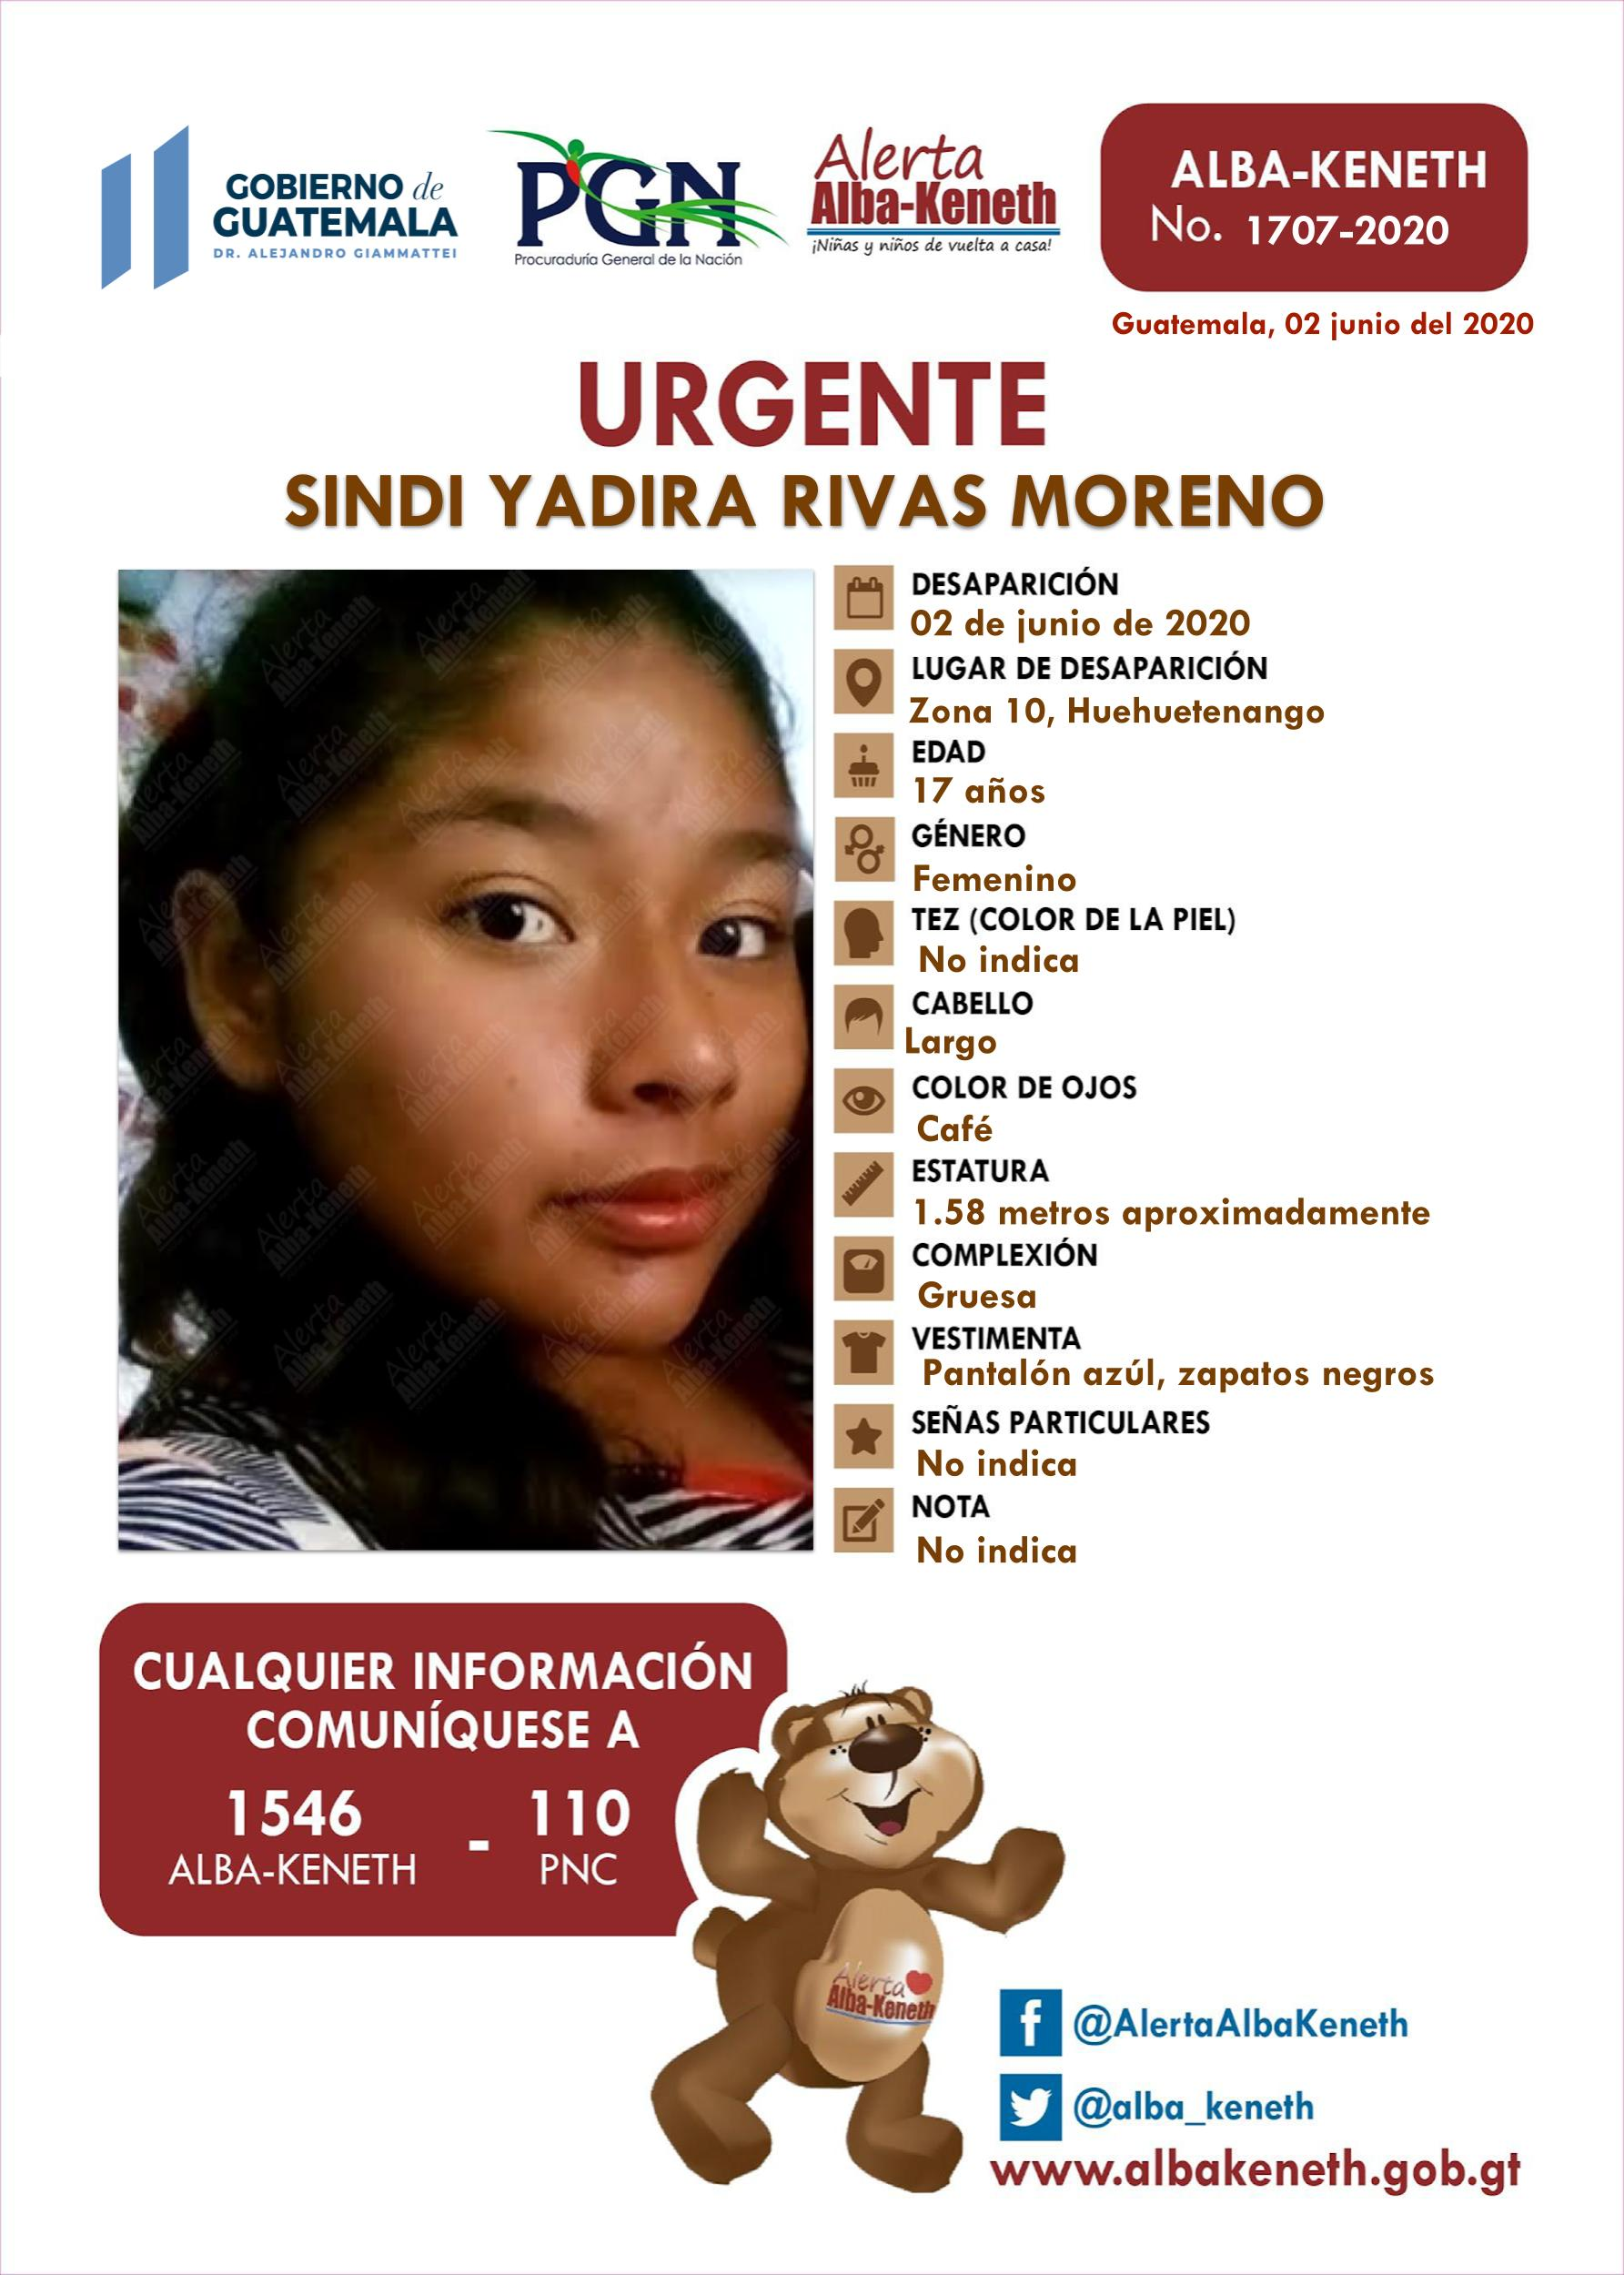 Sindi Yadira Rivas Moreno